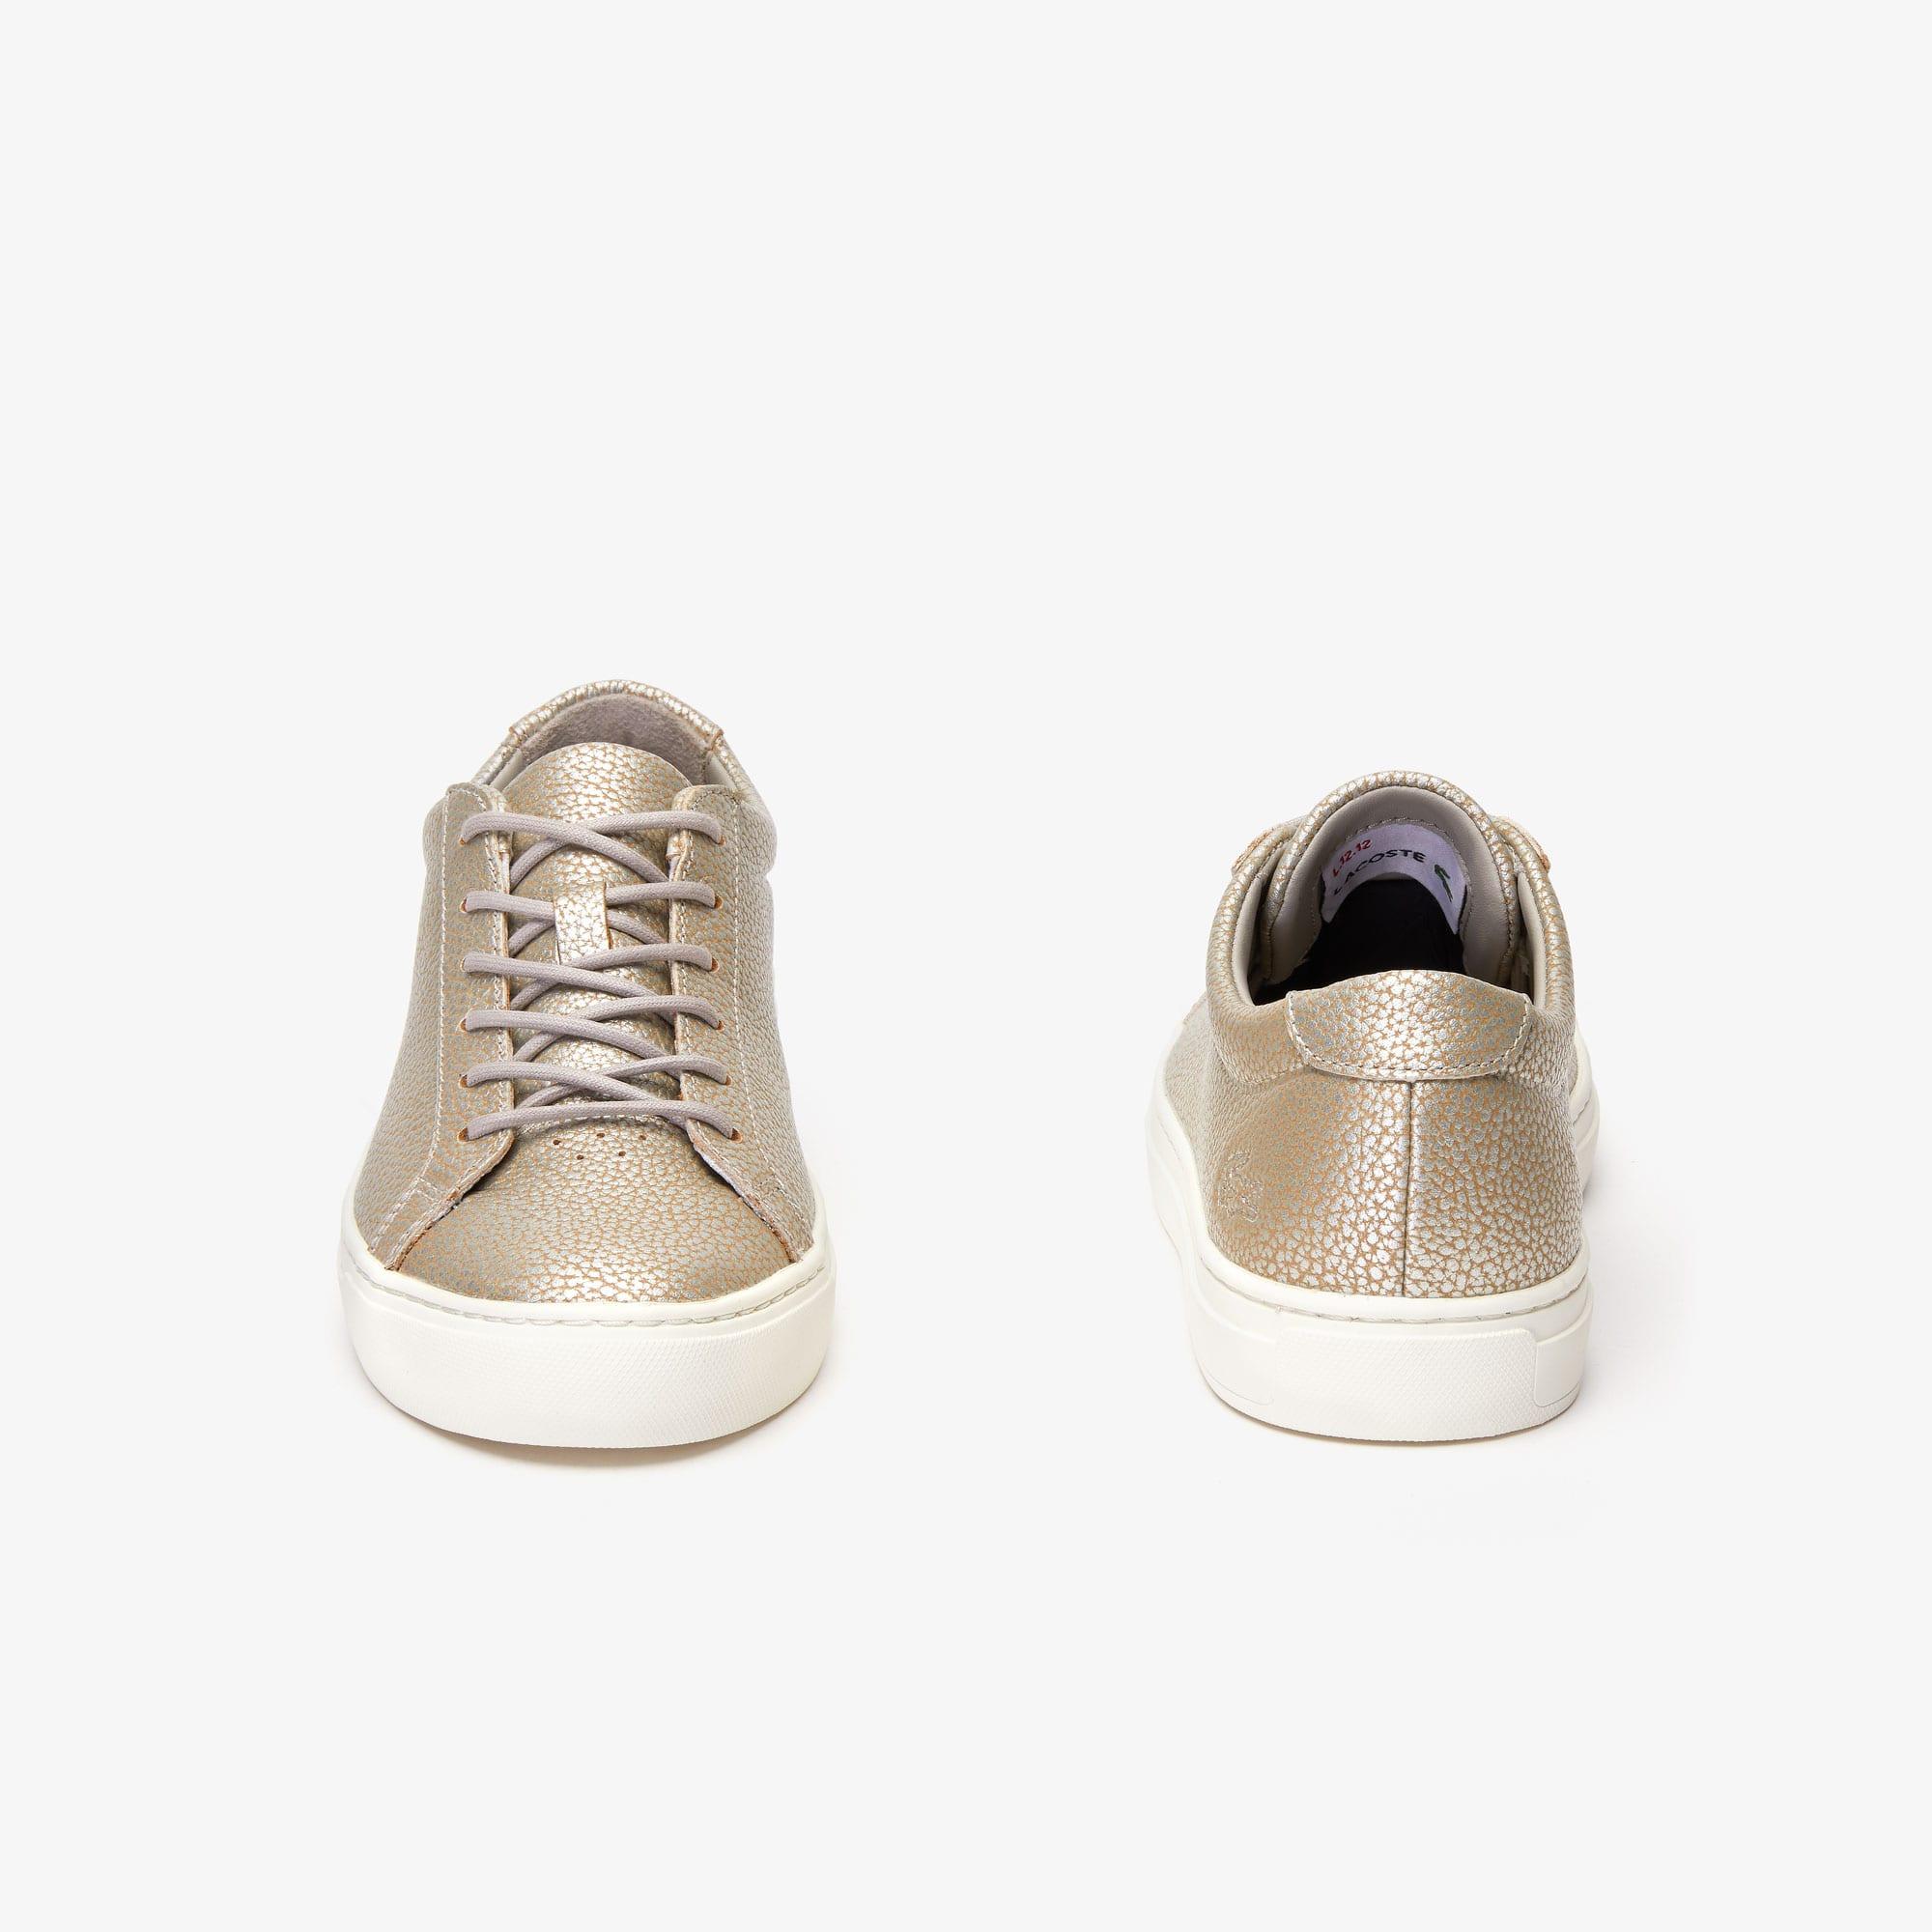 L Sneakers 12 En Femme Métallisé 12 Cuir CedxBo